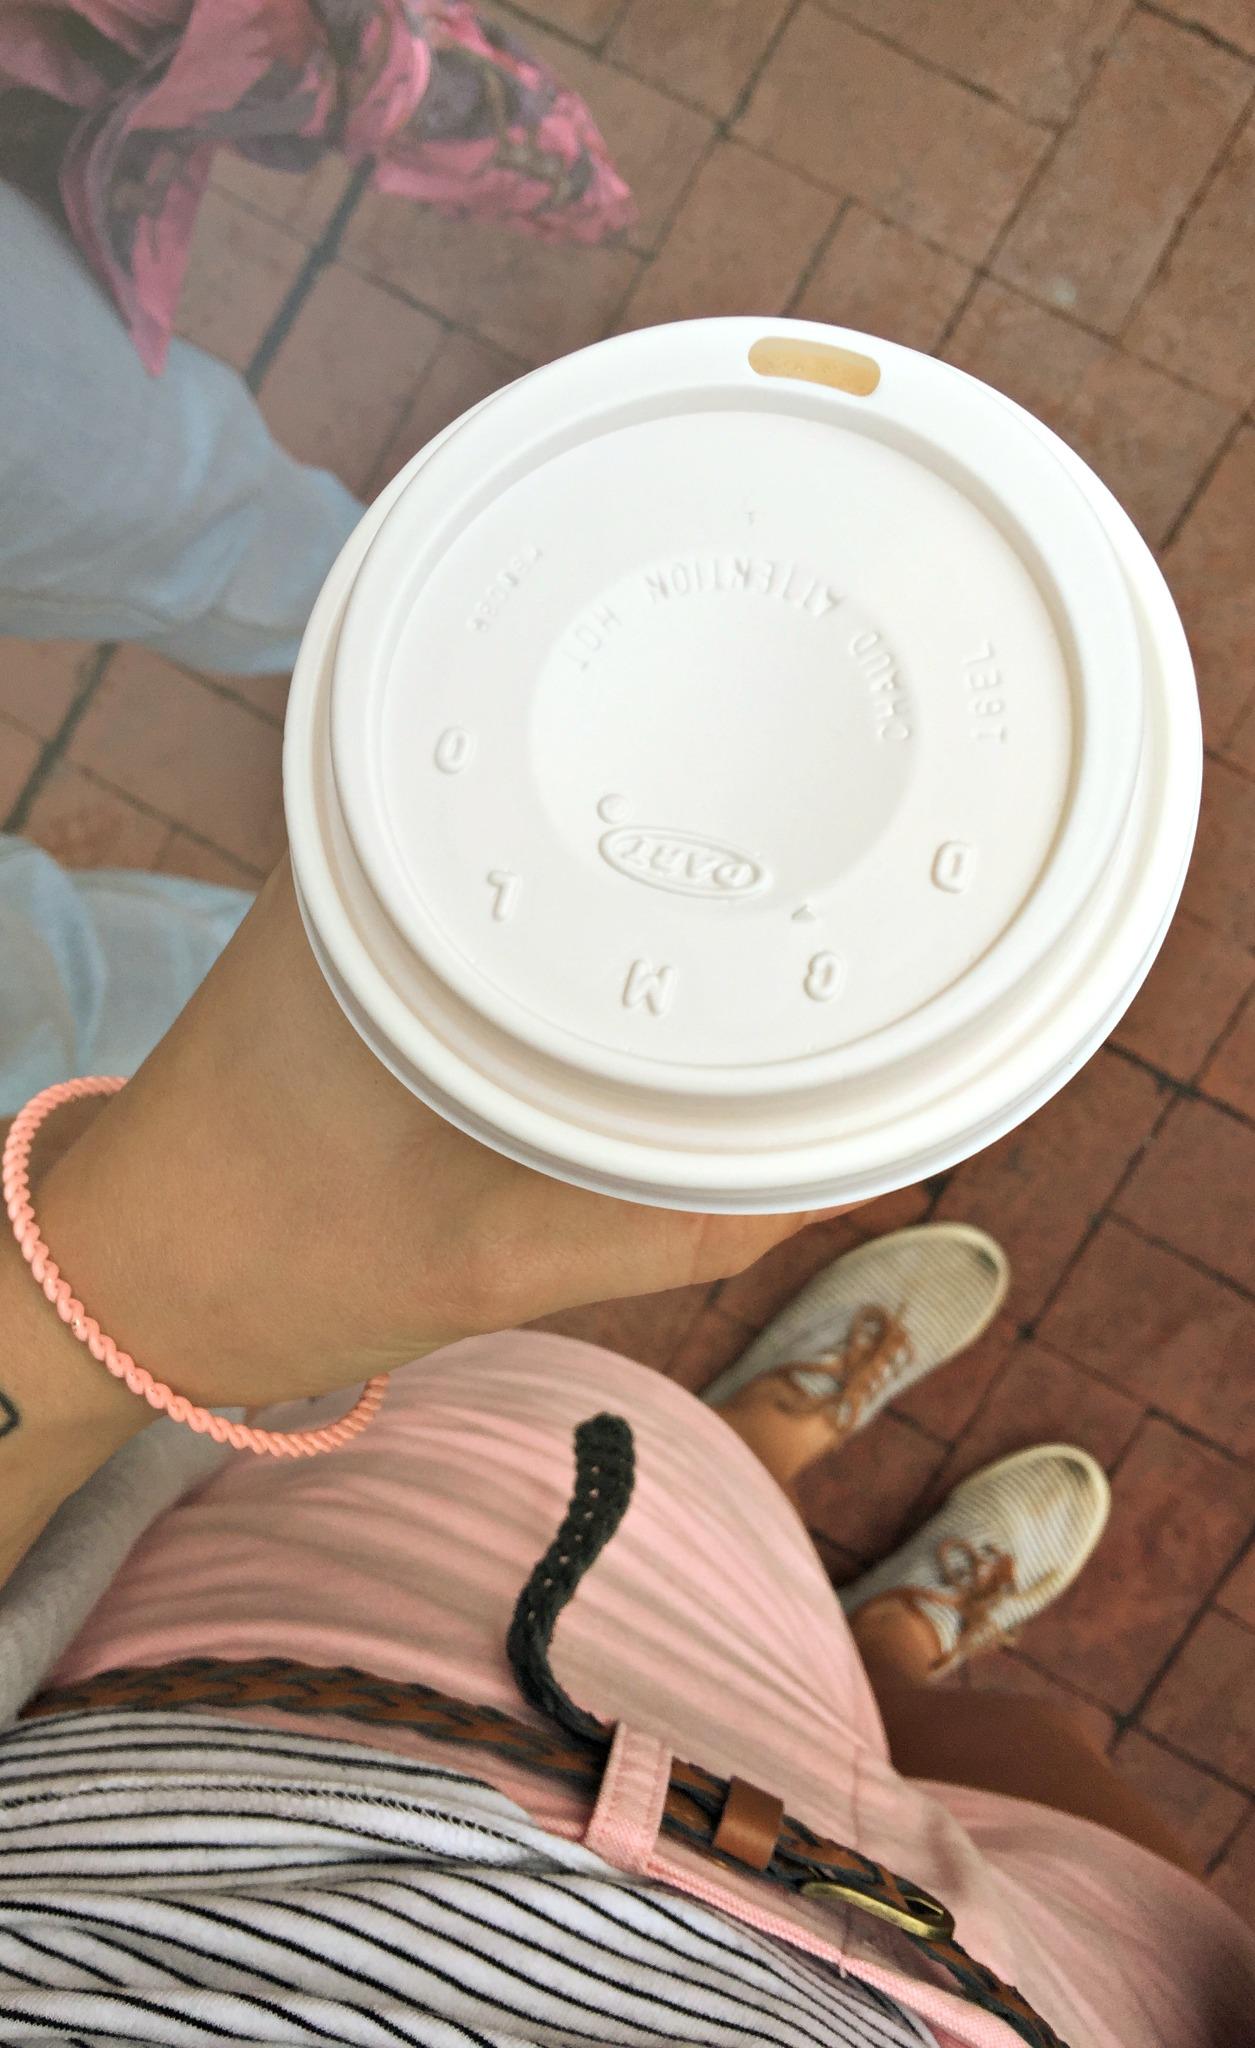 VICS COFFEE HOUSE SAVANNAH GEORGIA